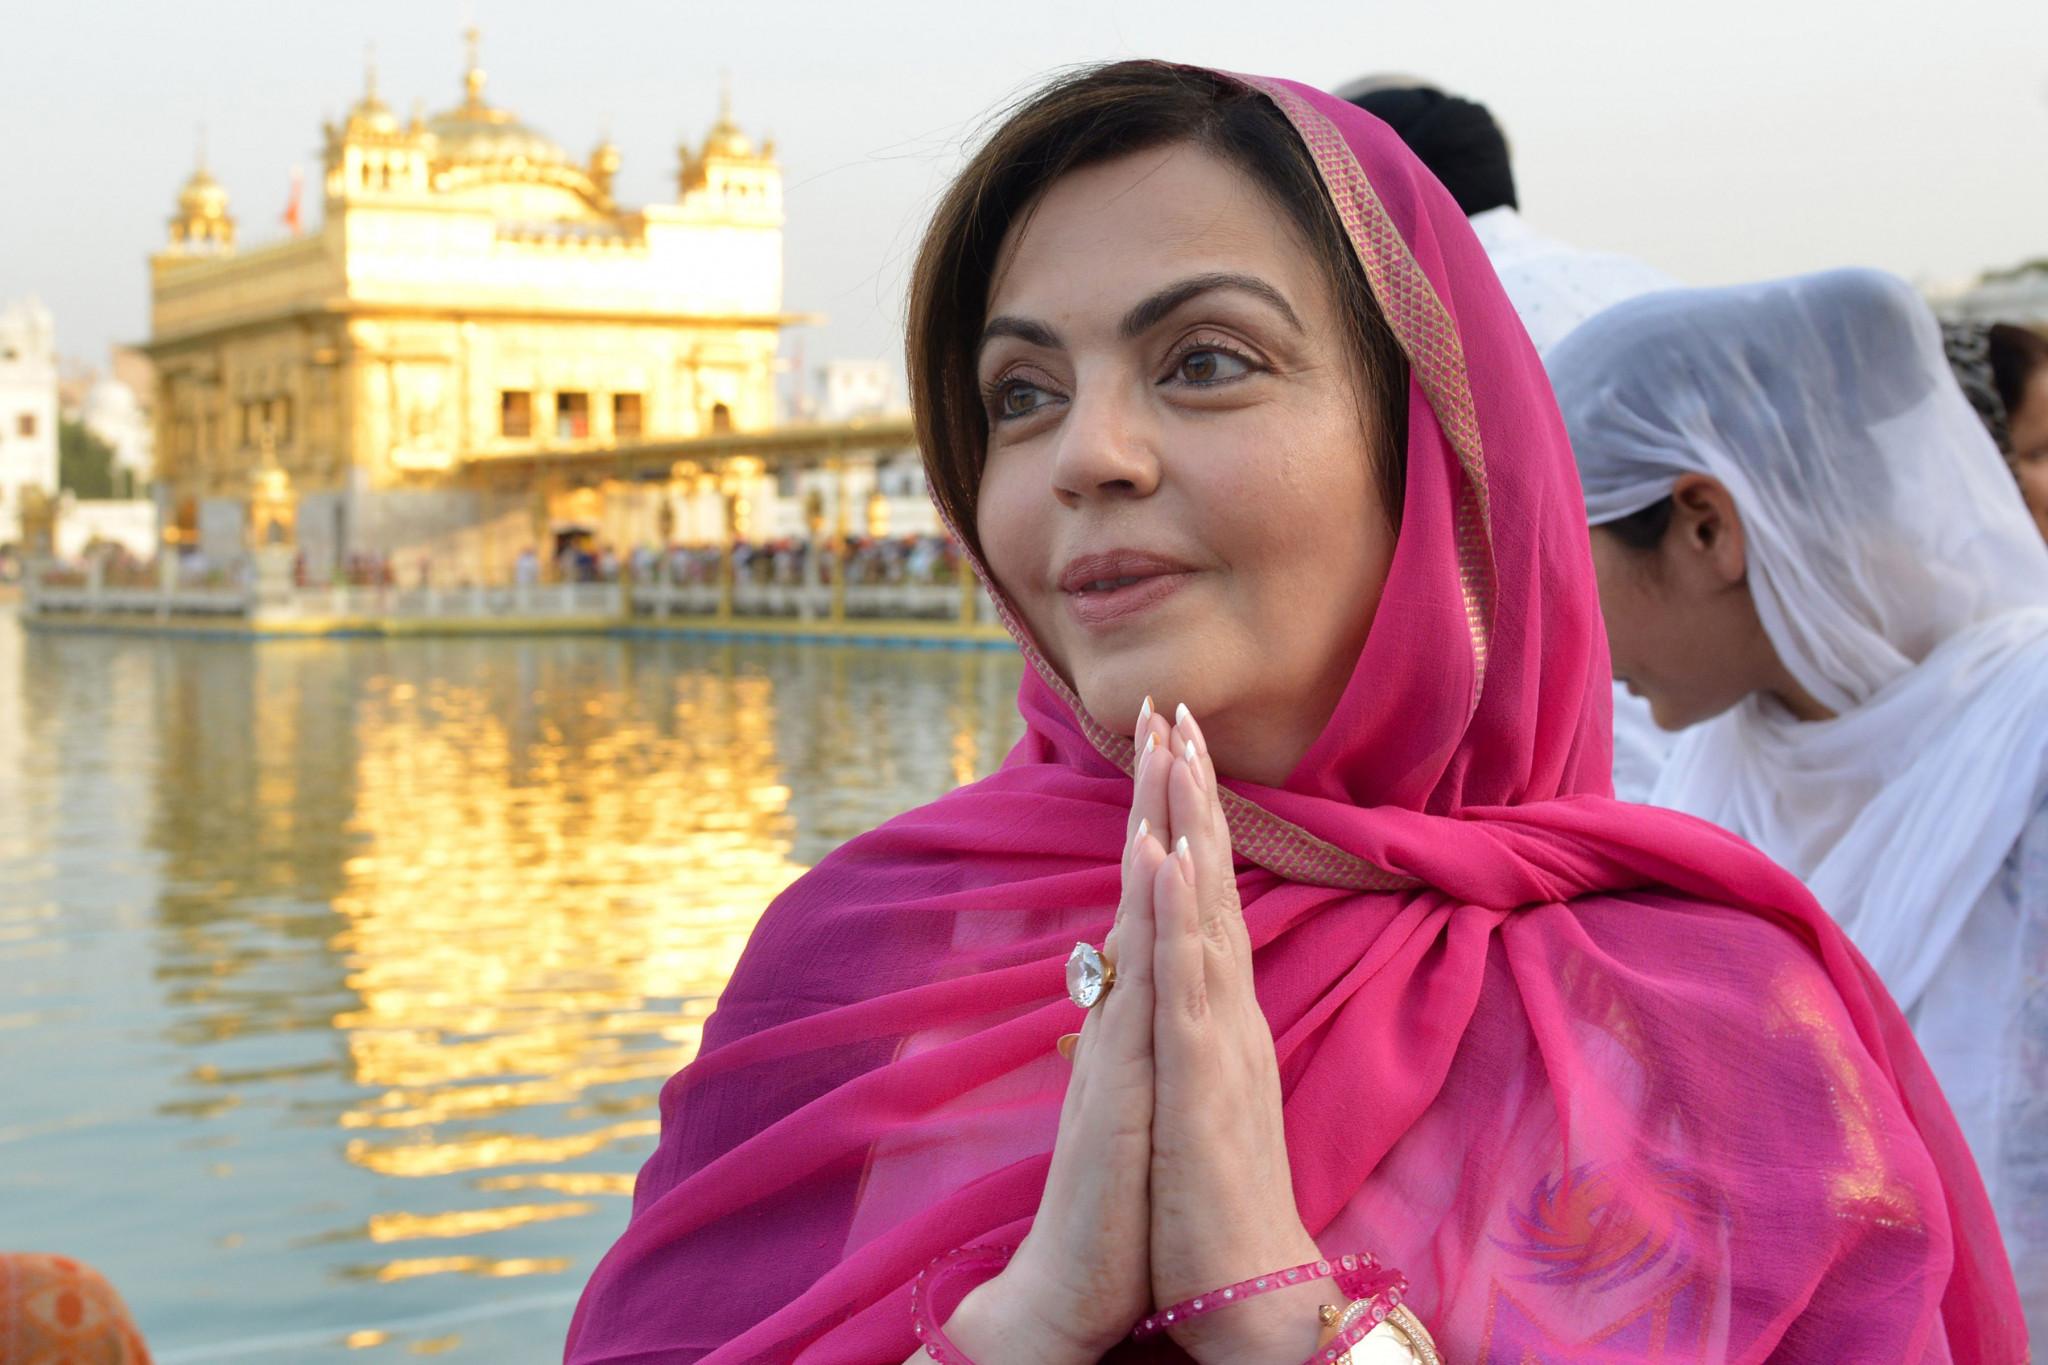 Nita Ambani is hopeful India will bid for the Olympics before she leaves the IOC ©Getty Images